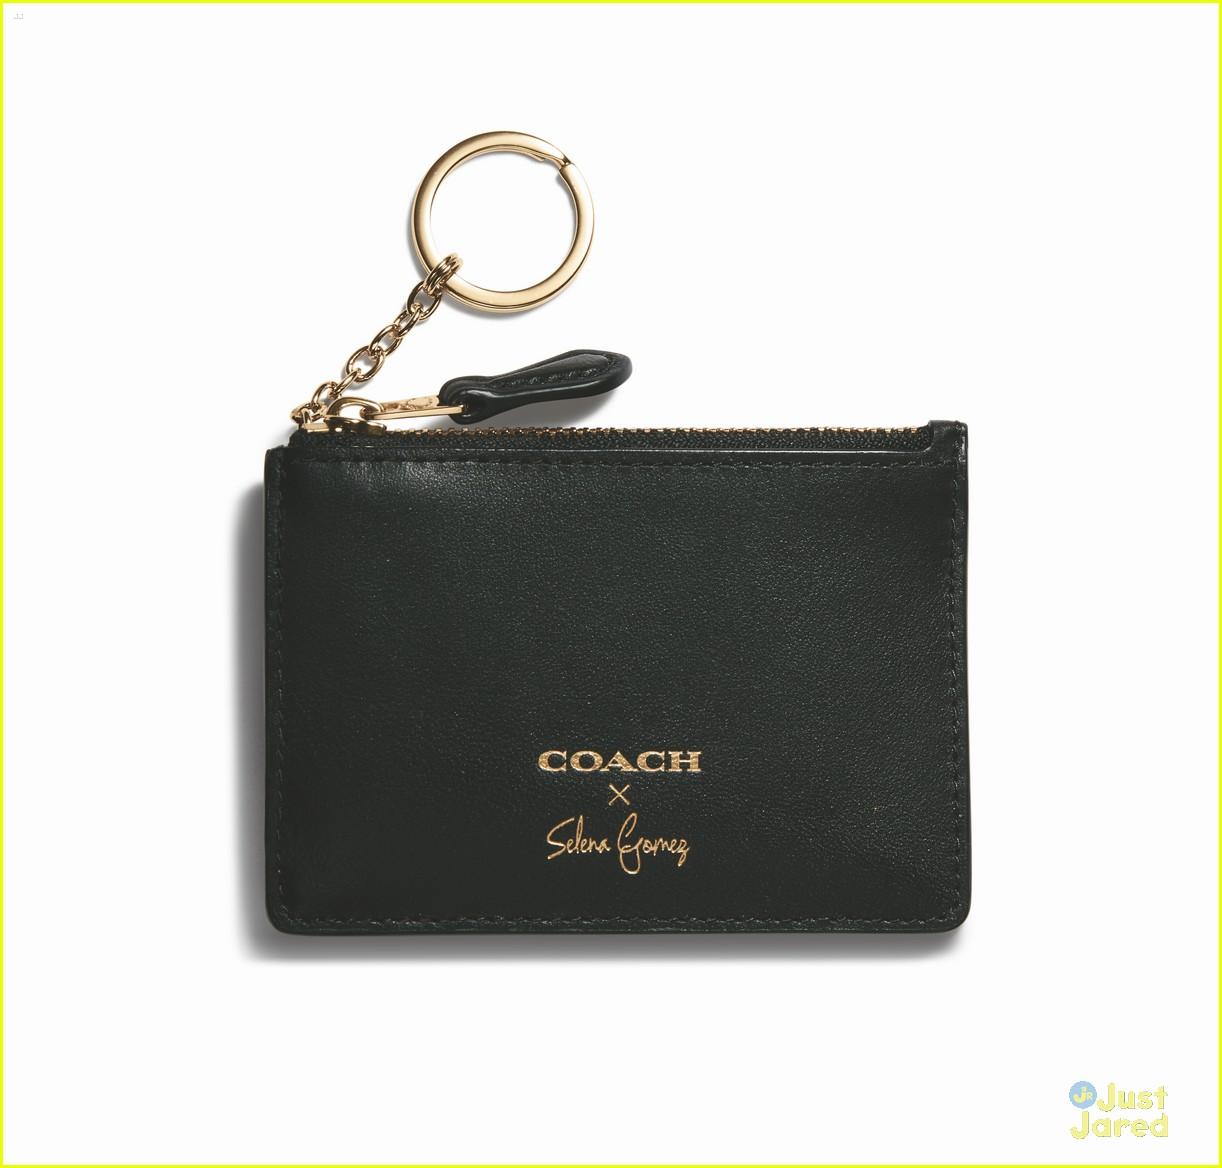 selena gomez selena grace coach bag 04